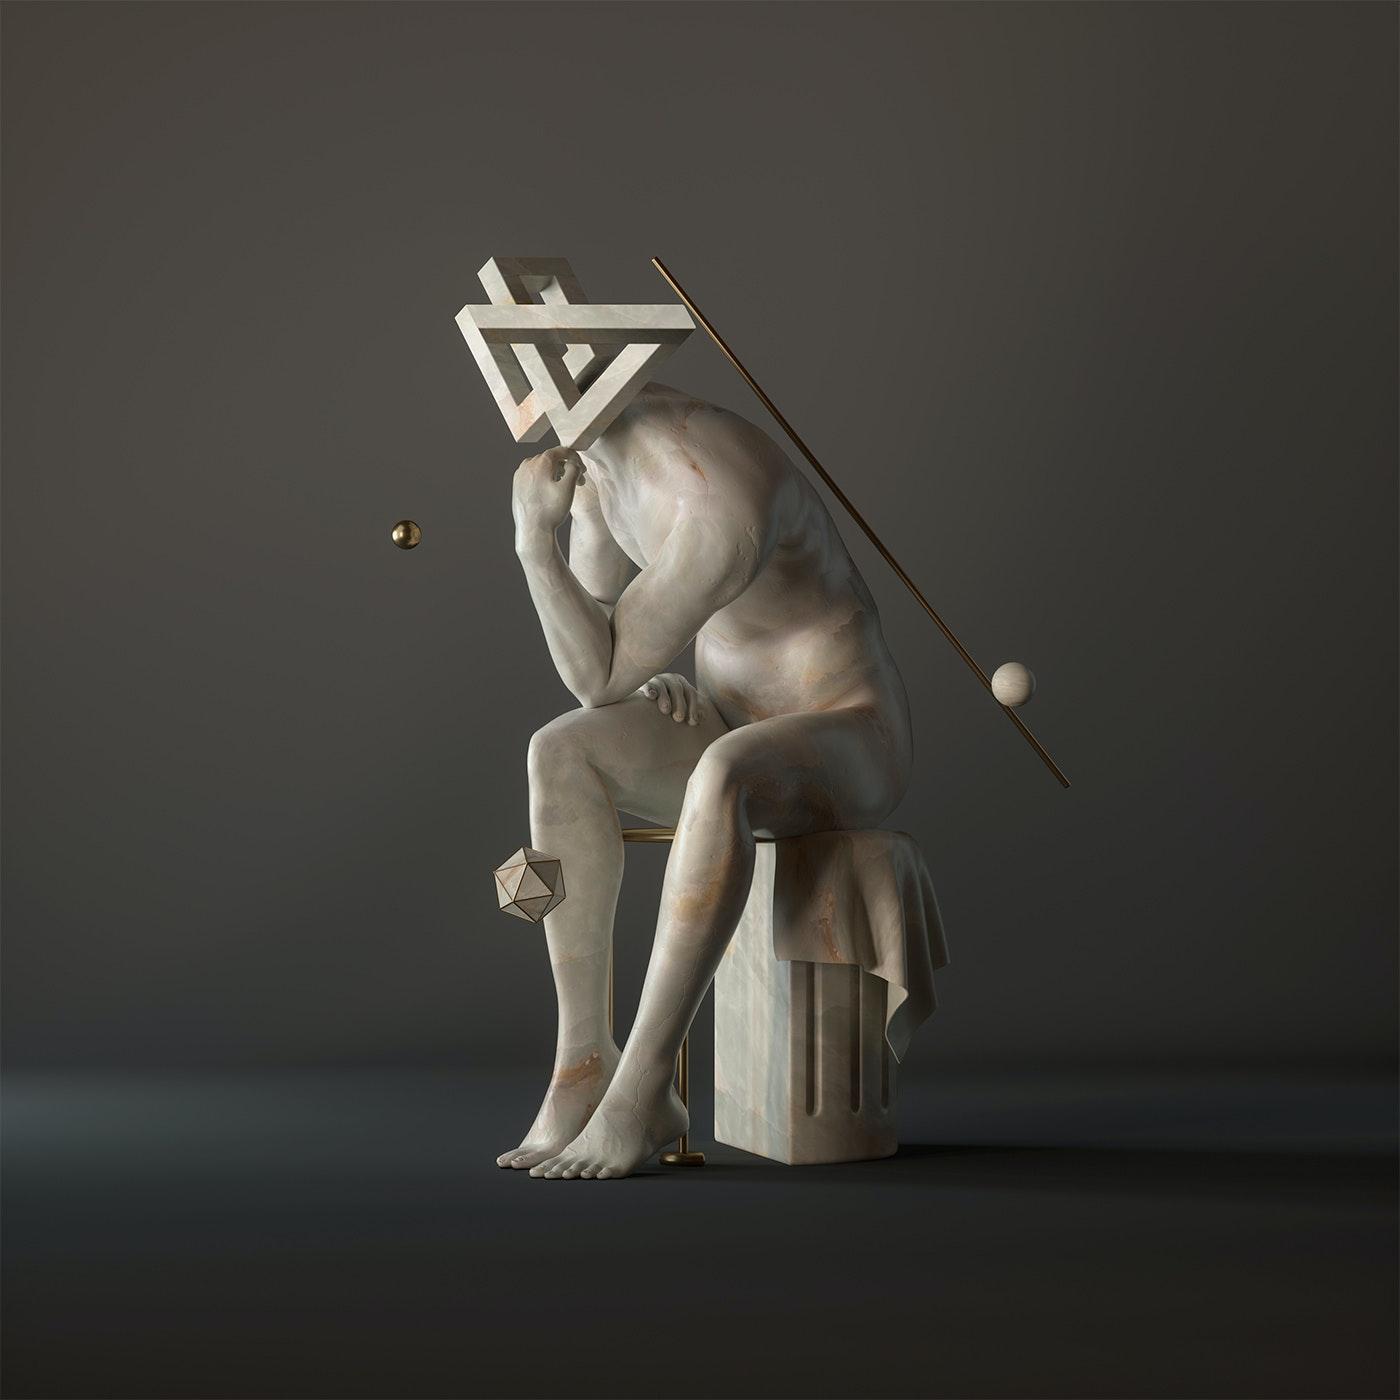 Ariel Palanzone - The Thinker